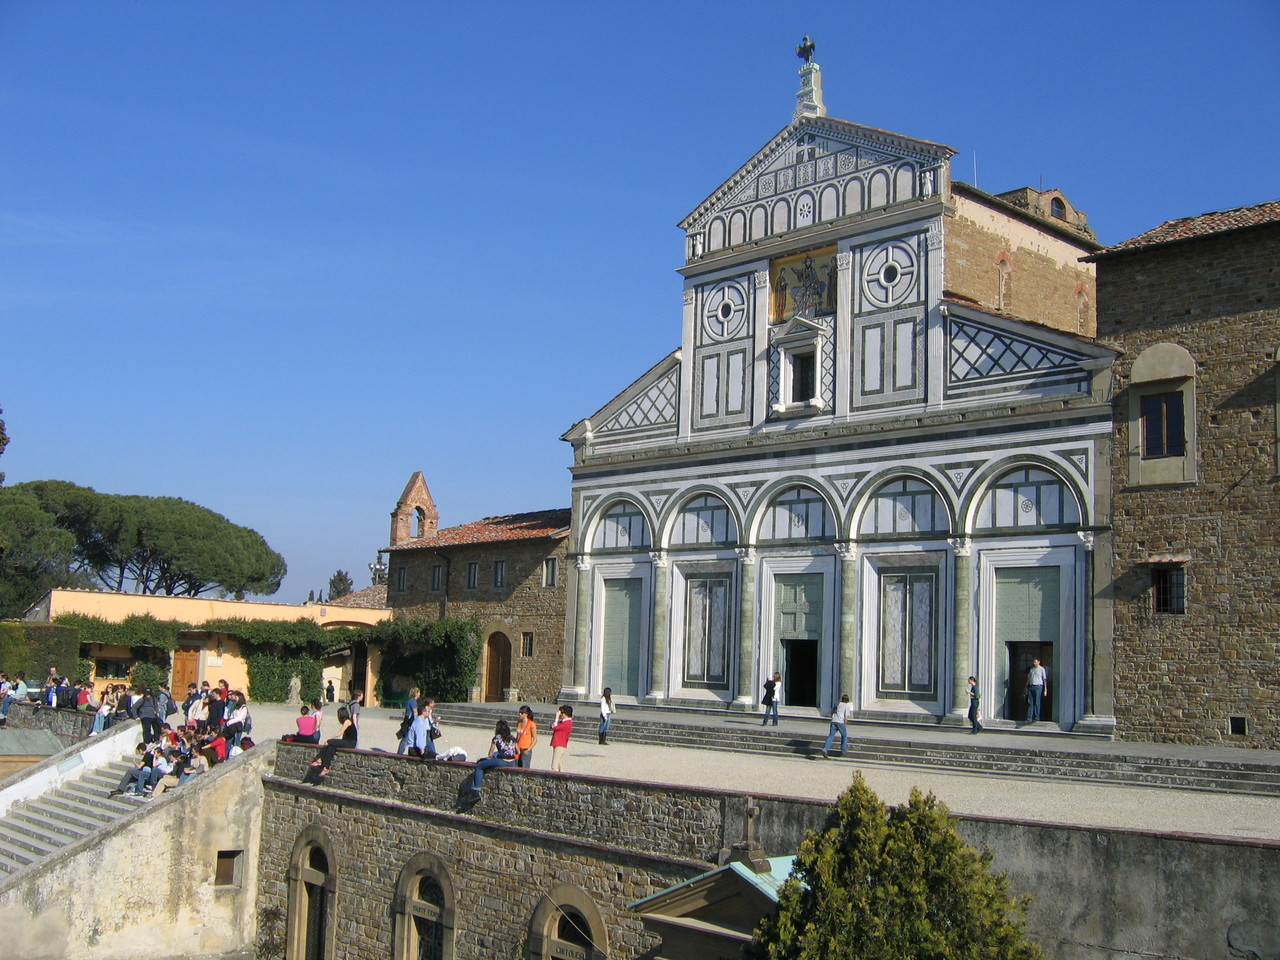 Базилика Сан-Миниато-аль-Монте